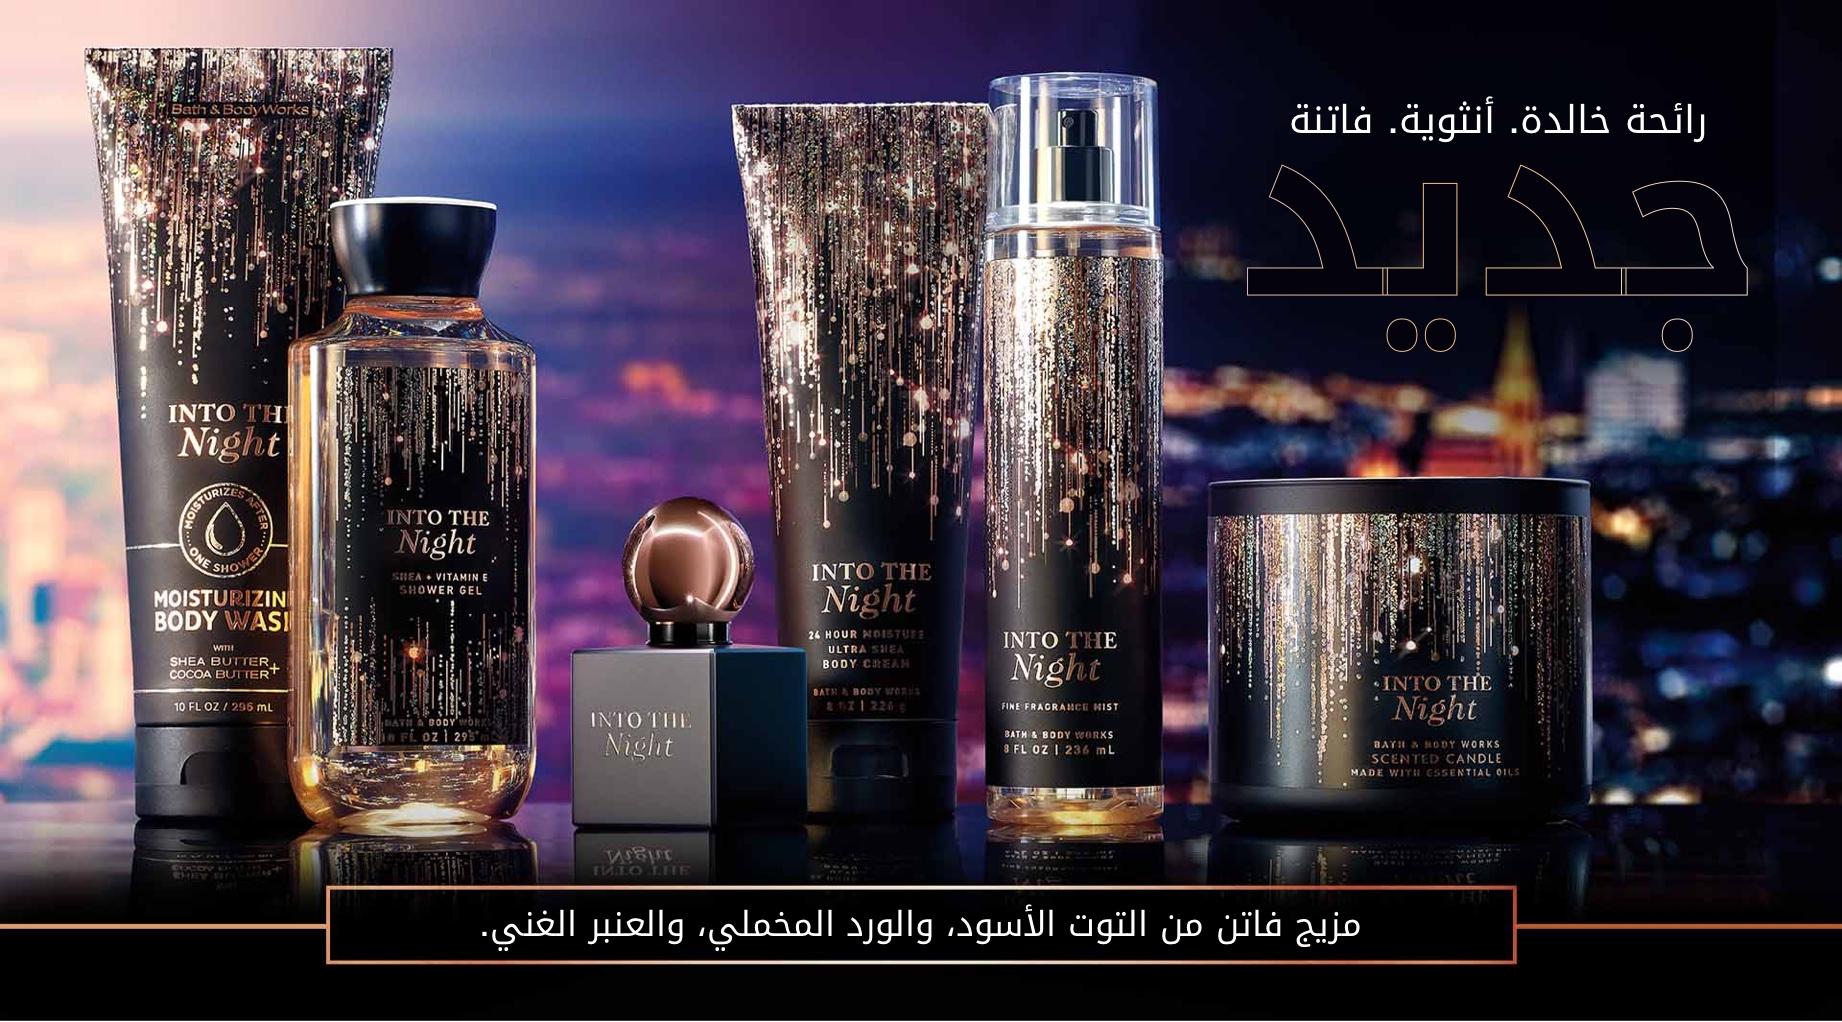 Into The Night تسوق Into The Night اونلاين بأفضل الأسعار في جدة و جدة باث بودي وركس السعودية